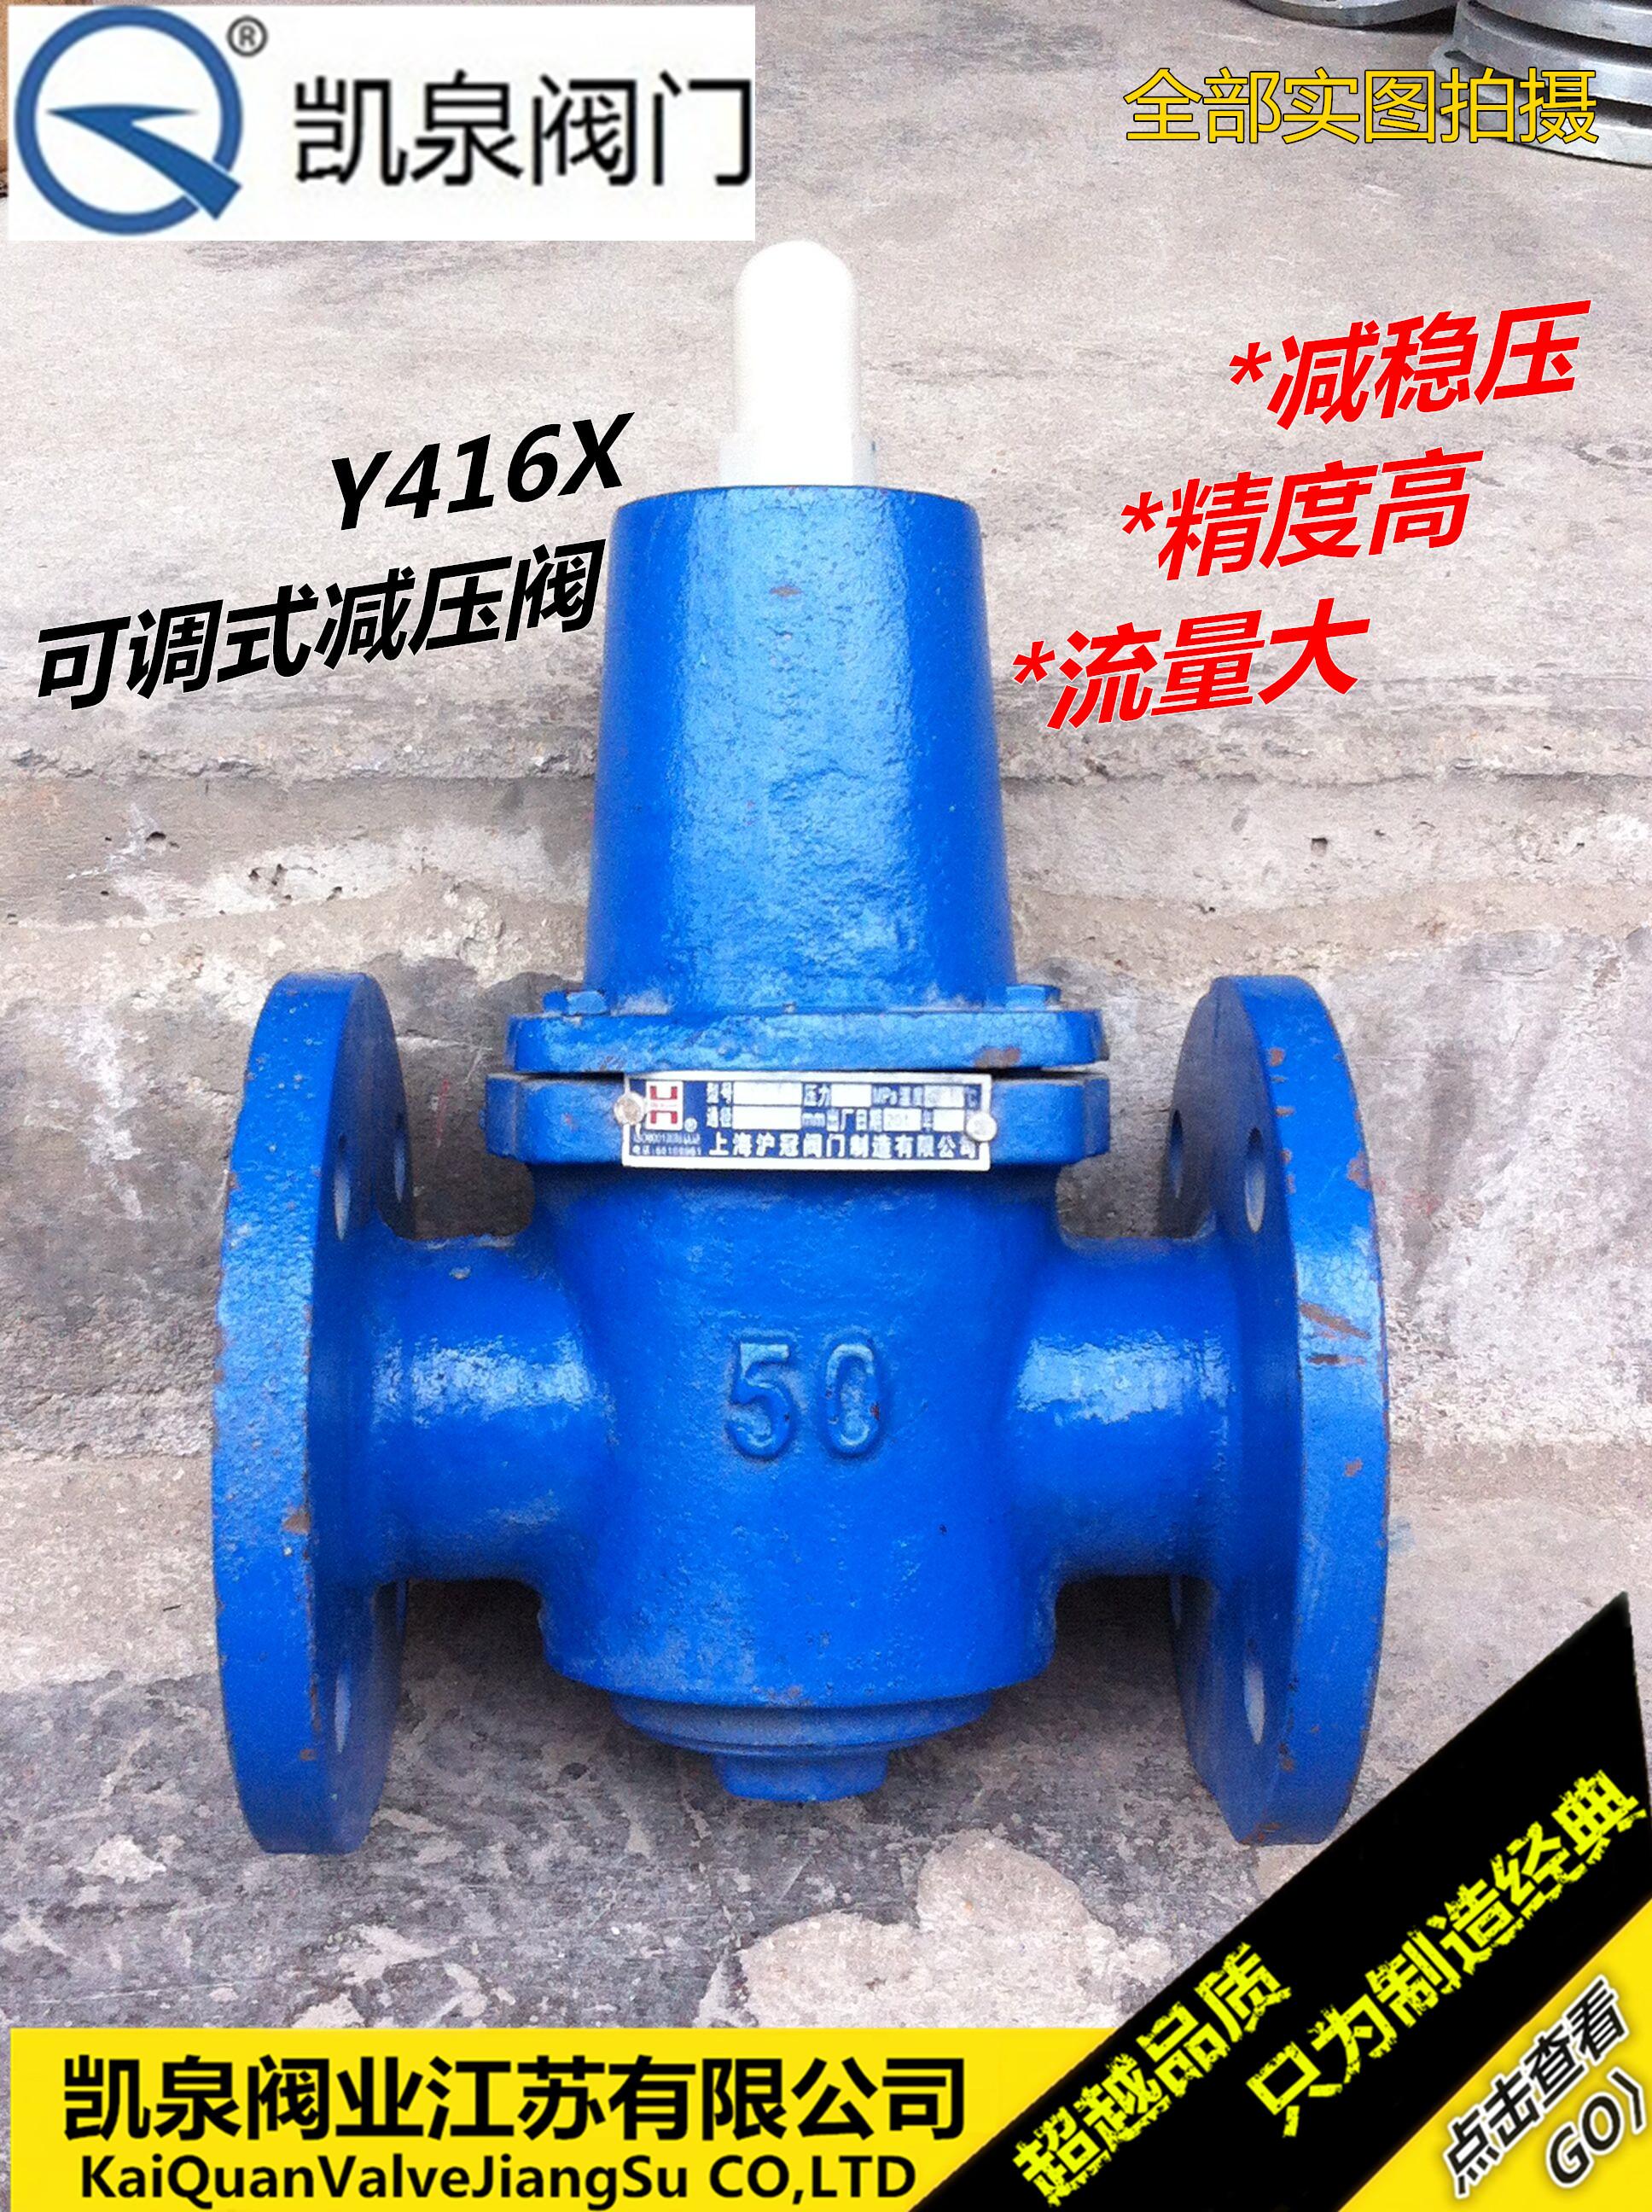 Y416X-16 เหล็กหล่อหน้าแปลนวาล์วลดความดันลดวาล์วปรับแรงดันน้ำปรับแรงดันน้ำบีบอัด DN80